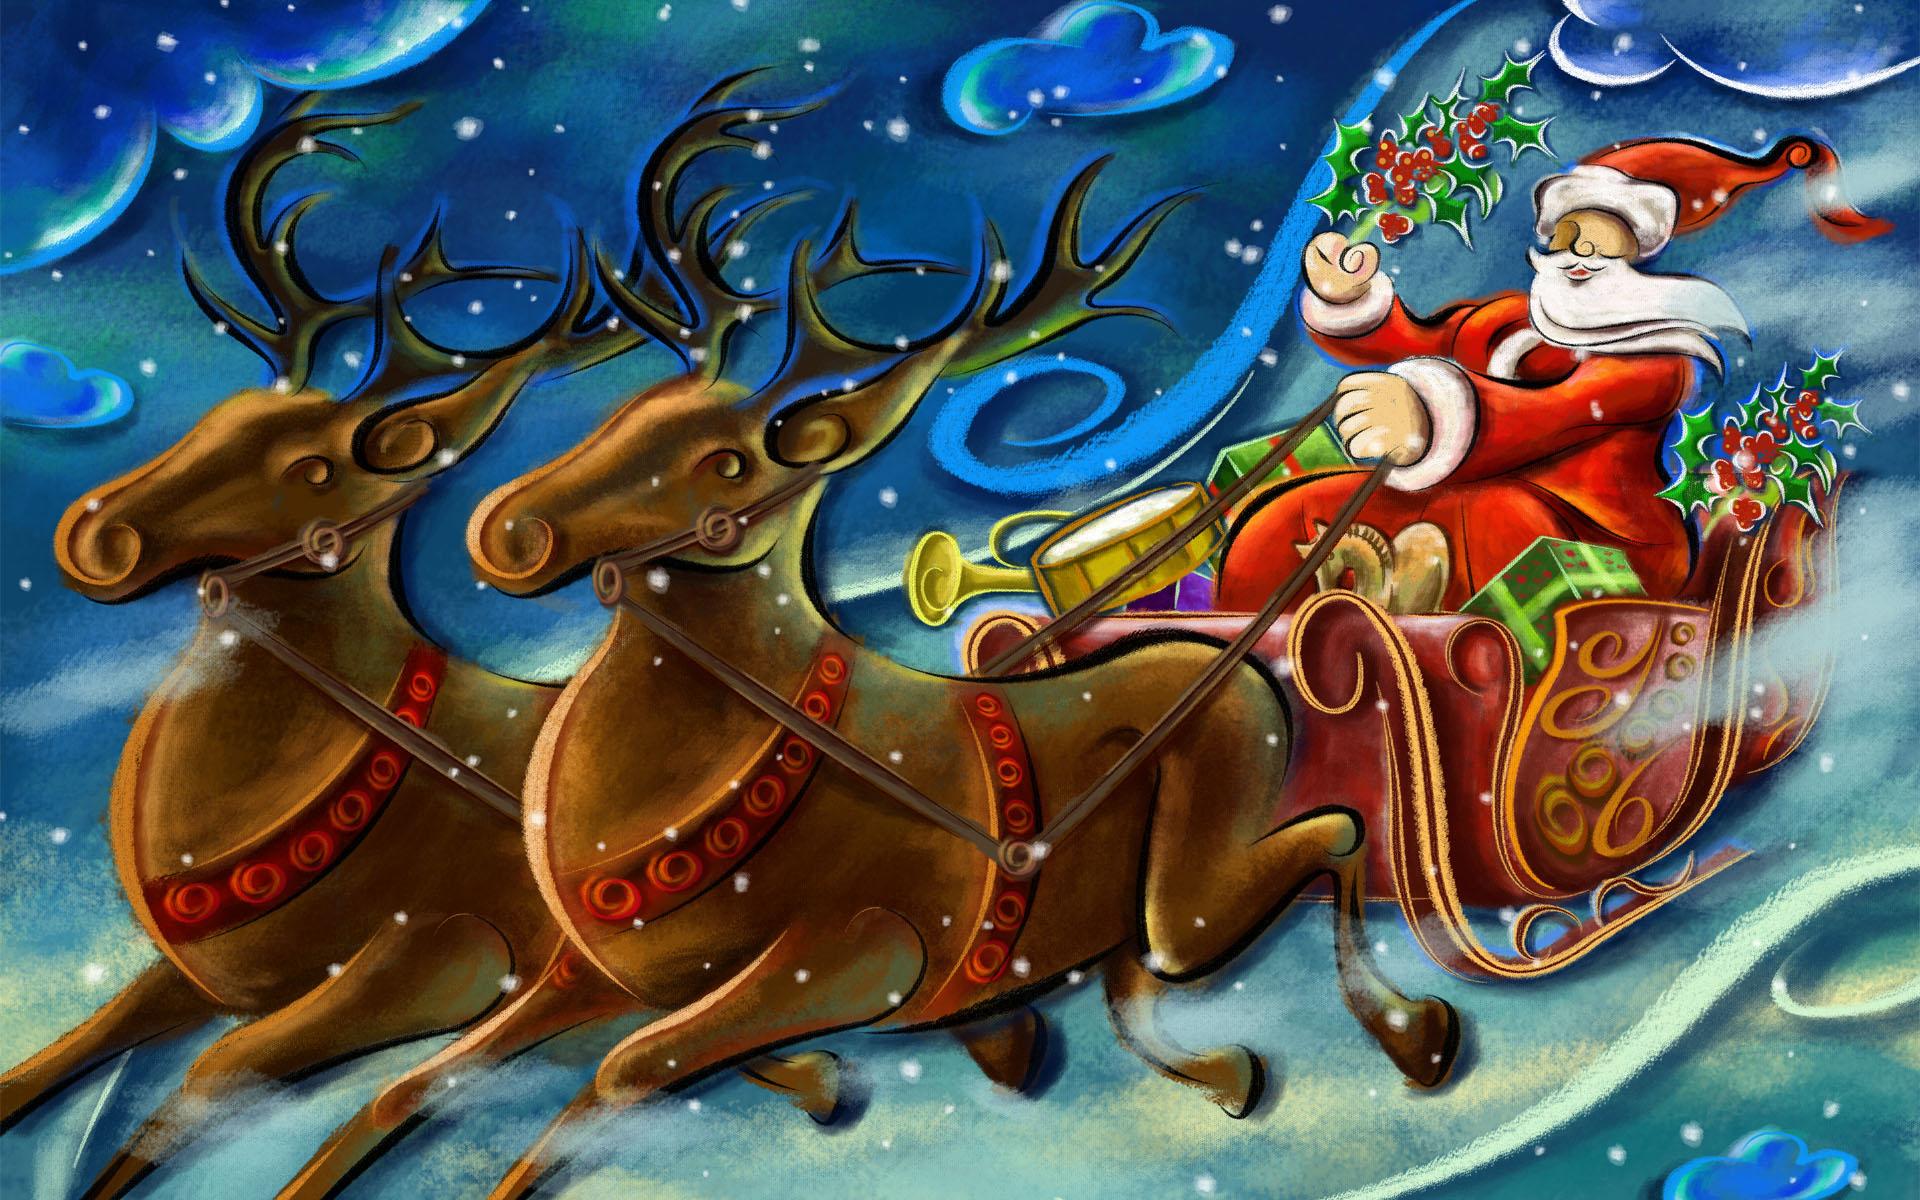 Santa Clause Creative Art Work Wallpapers HD Wallpapers 1920x1200